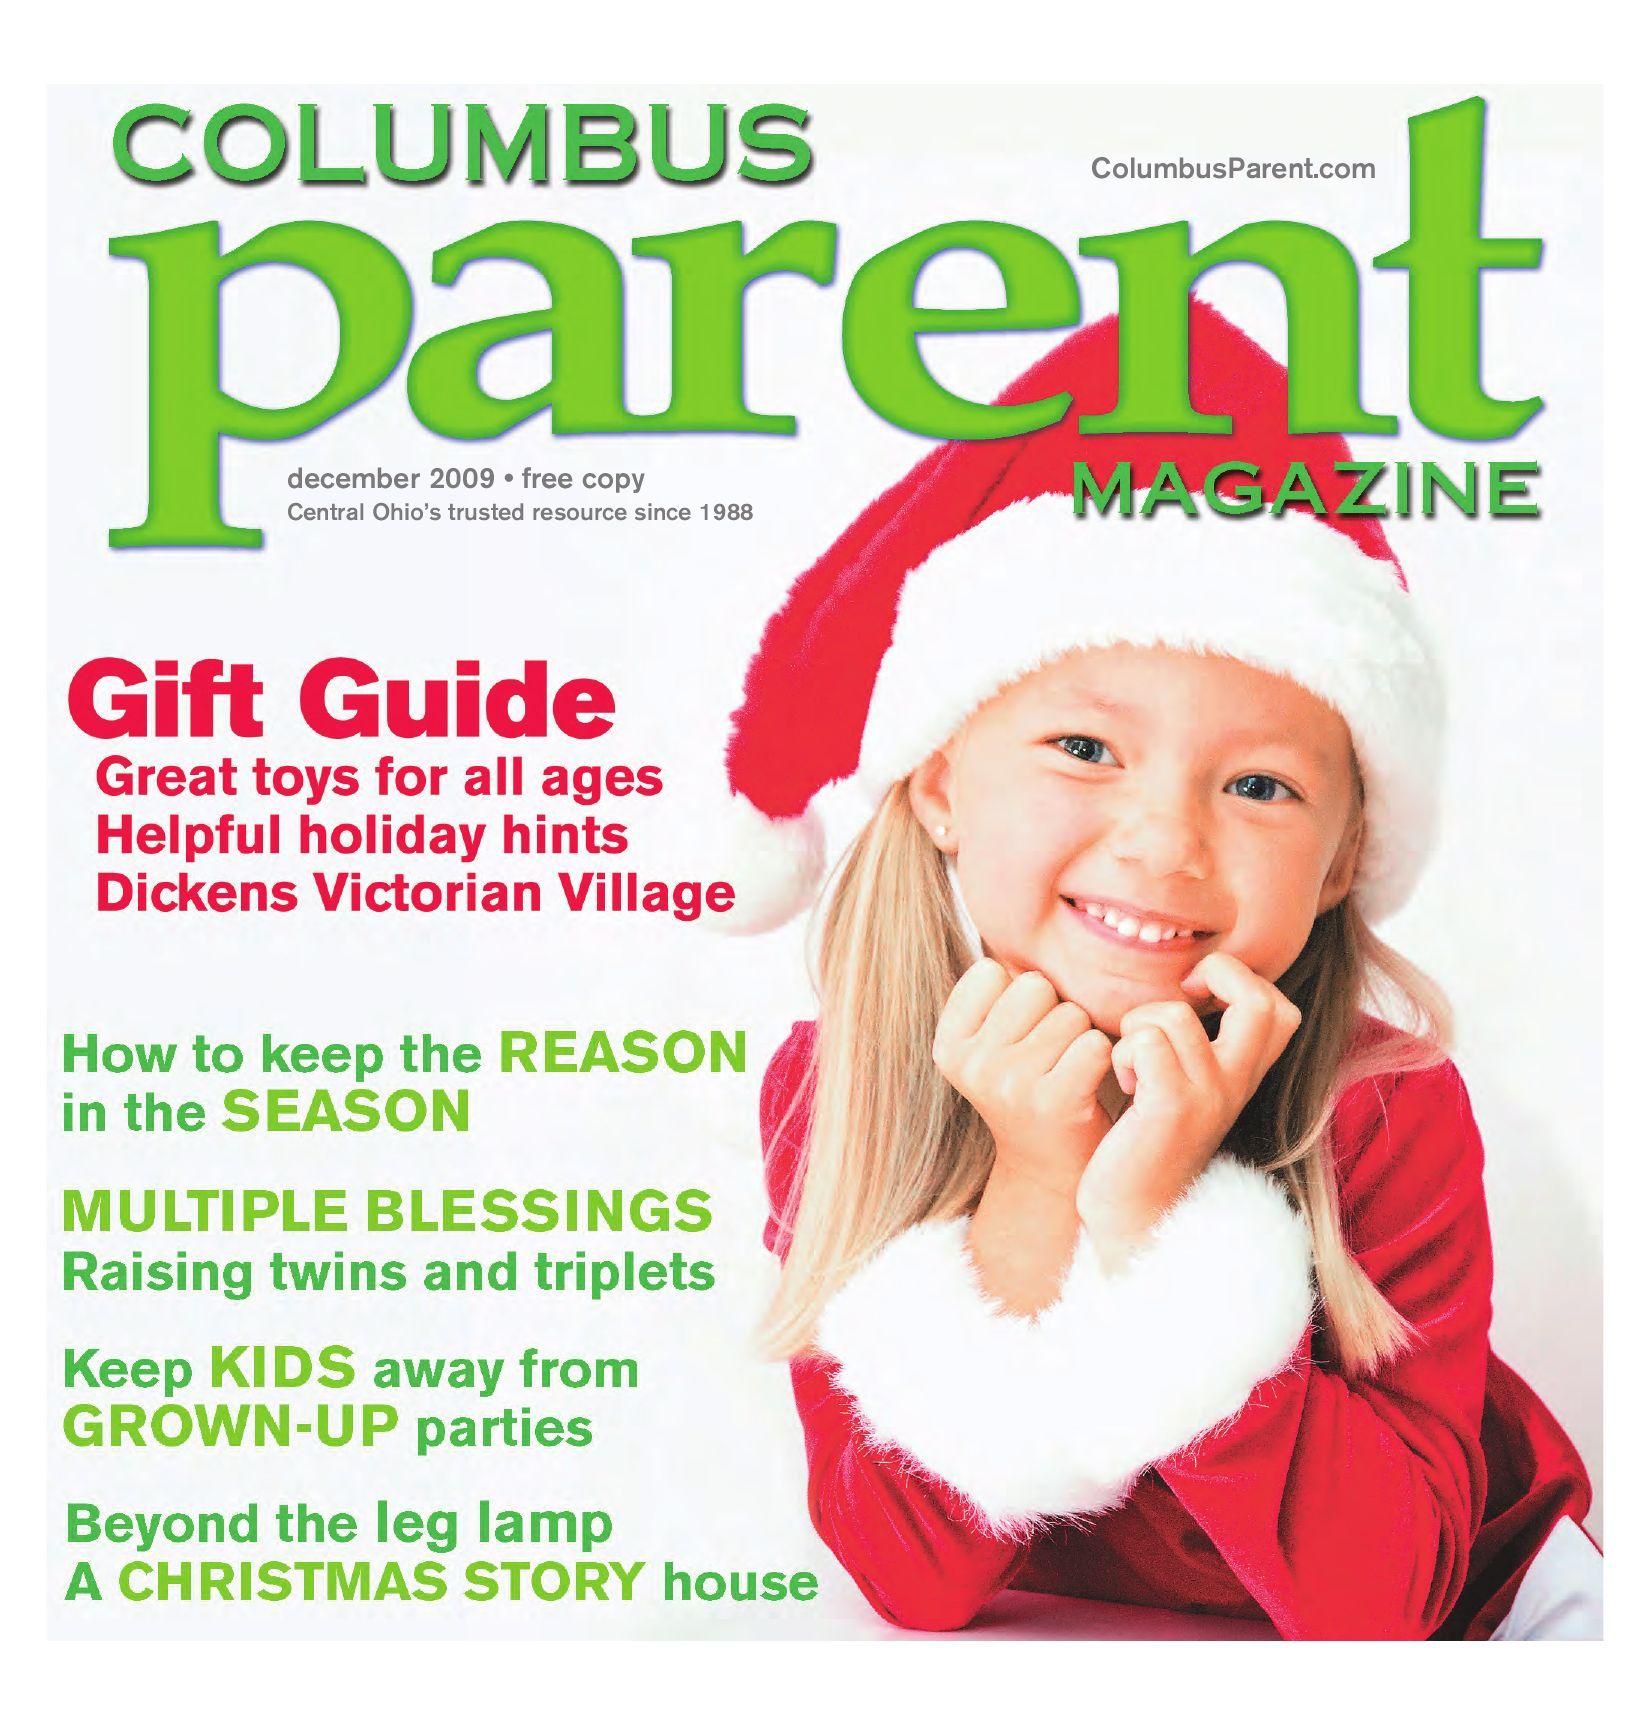 bd824a784adc1 Columbus Parent Magazine - December 2009 by The Columbus Dispatch ...